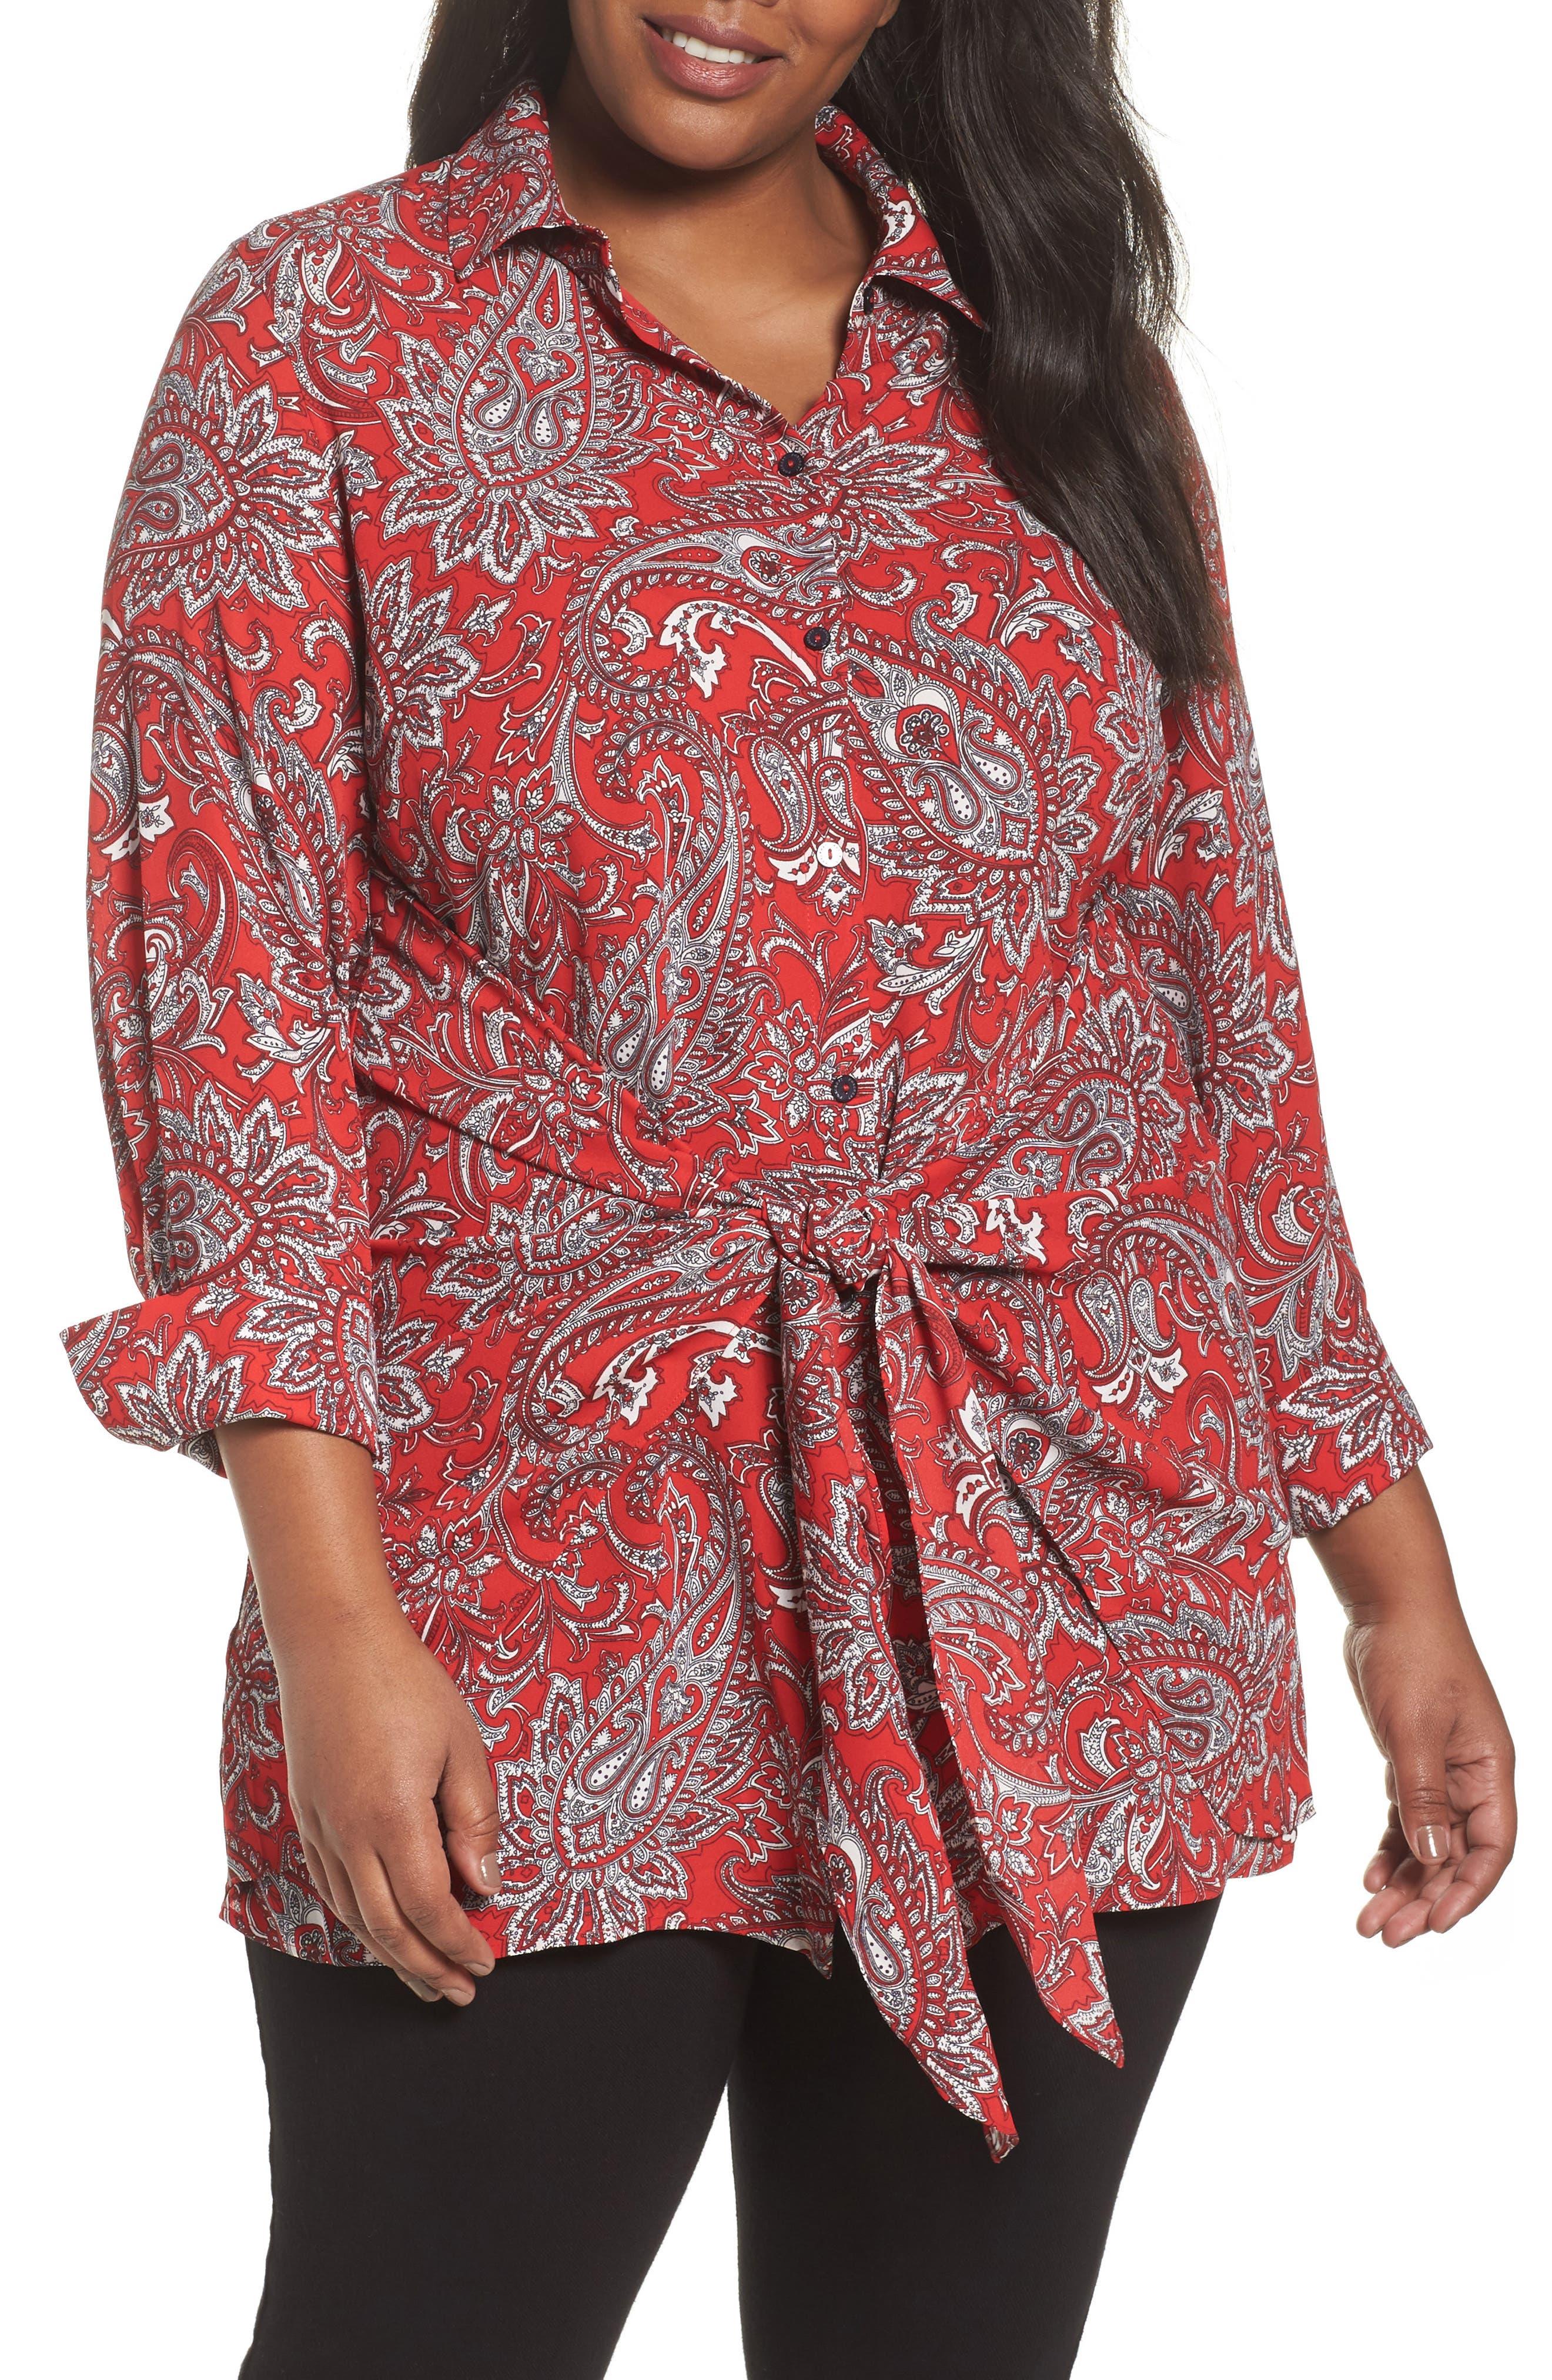 Foxcroft Serena Romantic Paisley Knotted Crepe Tunic Blouse (Plus Size)